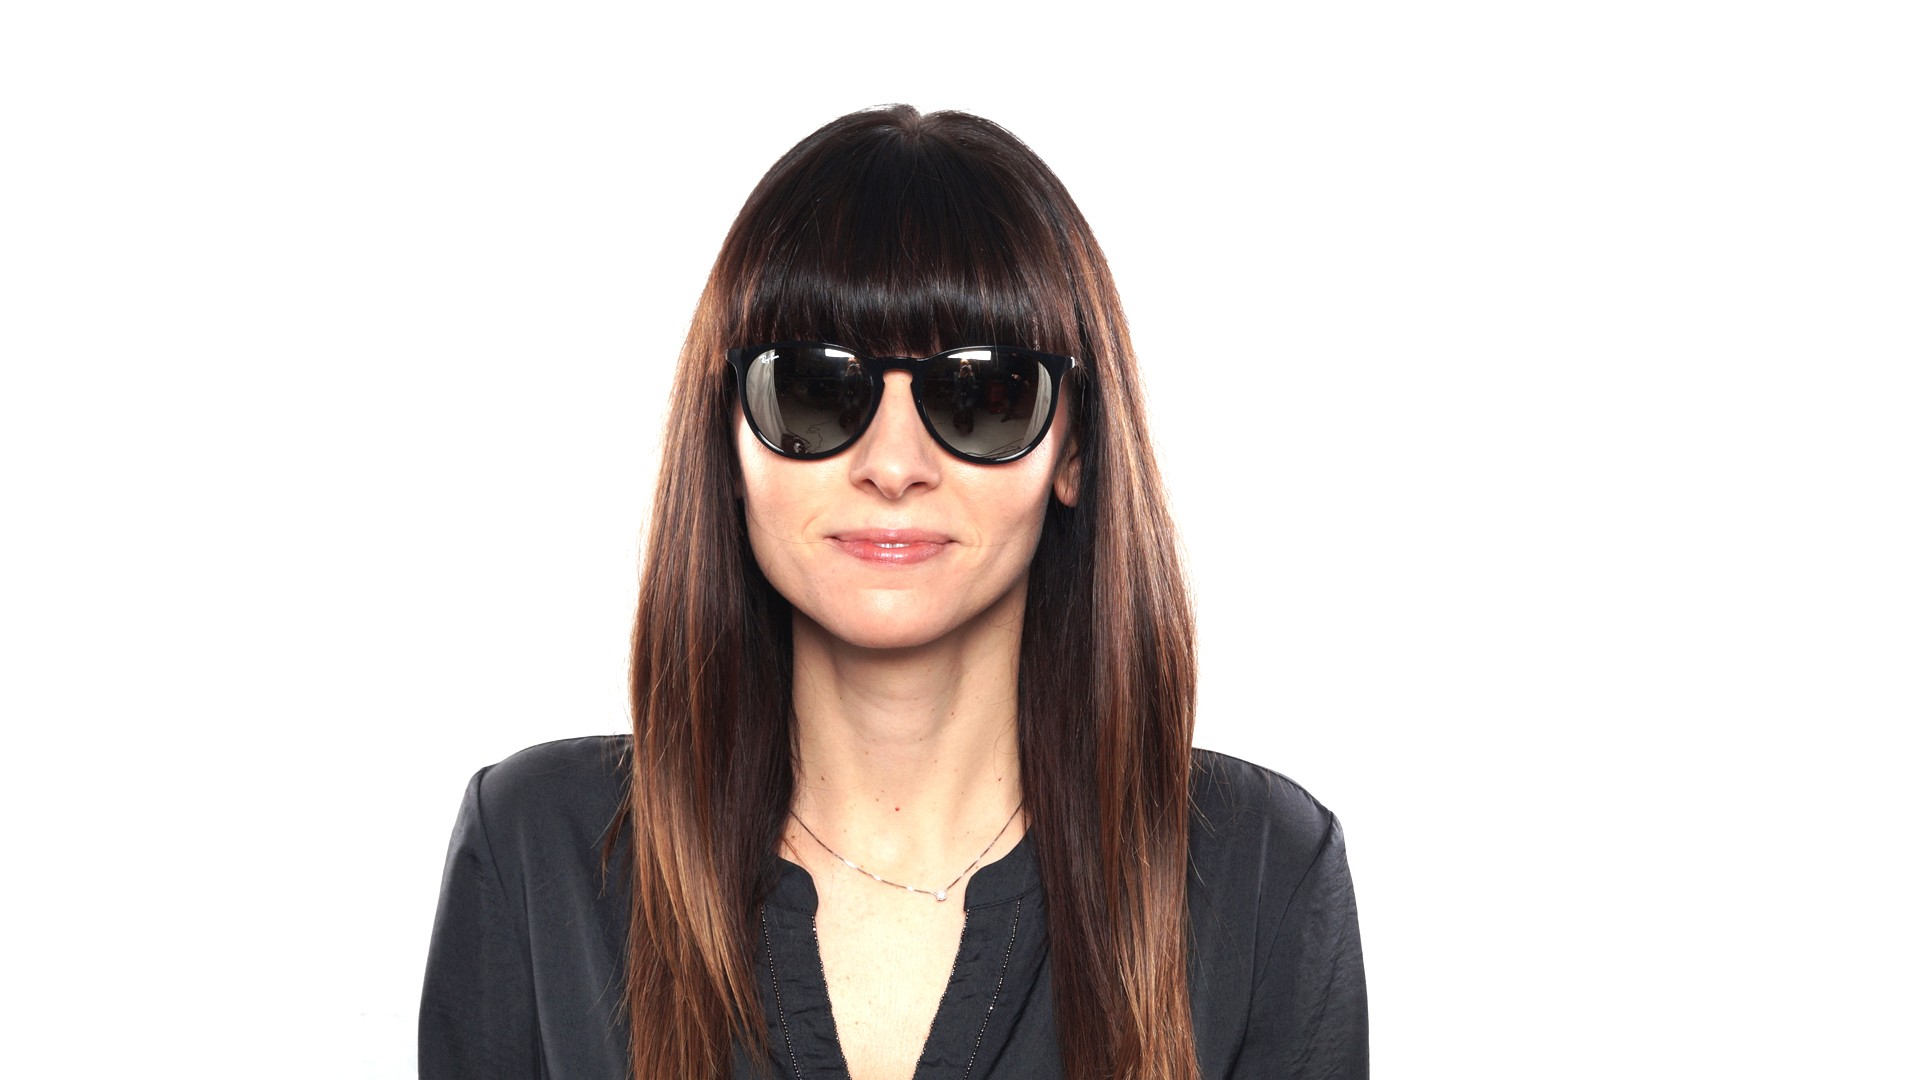 Sunglasses Ray-Ban Erika Black RB4171 601 5A 54-18 Medium Mirror 15ab7e4d84